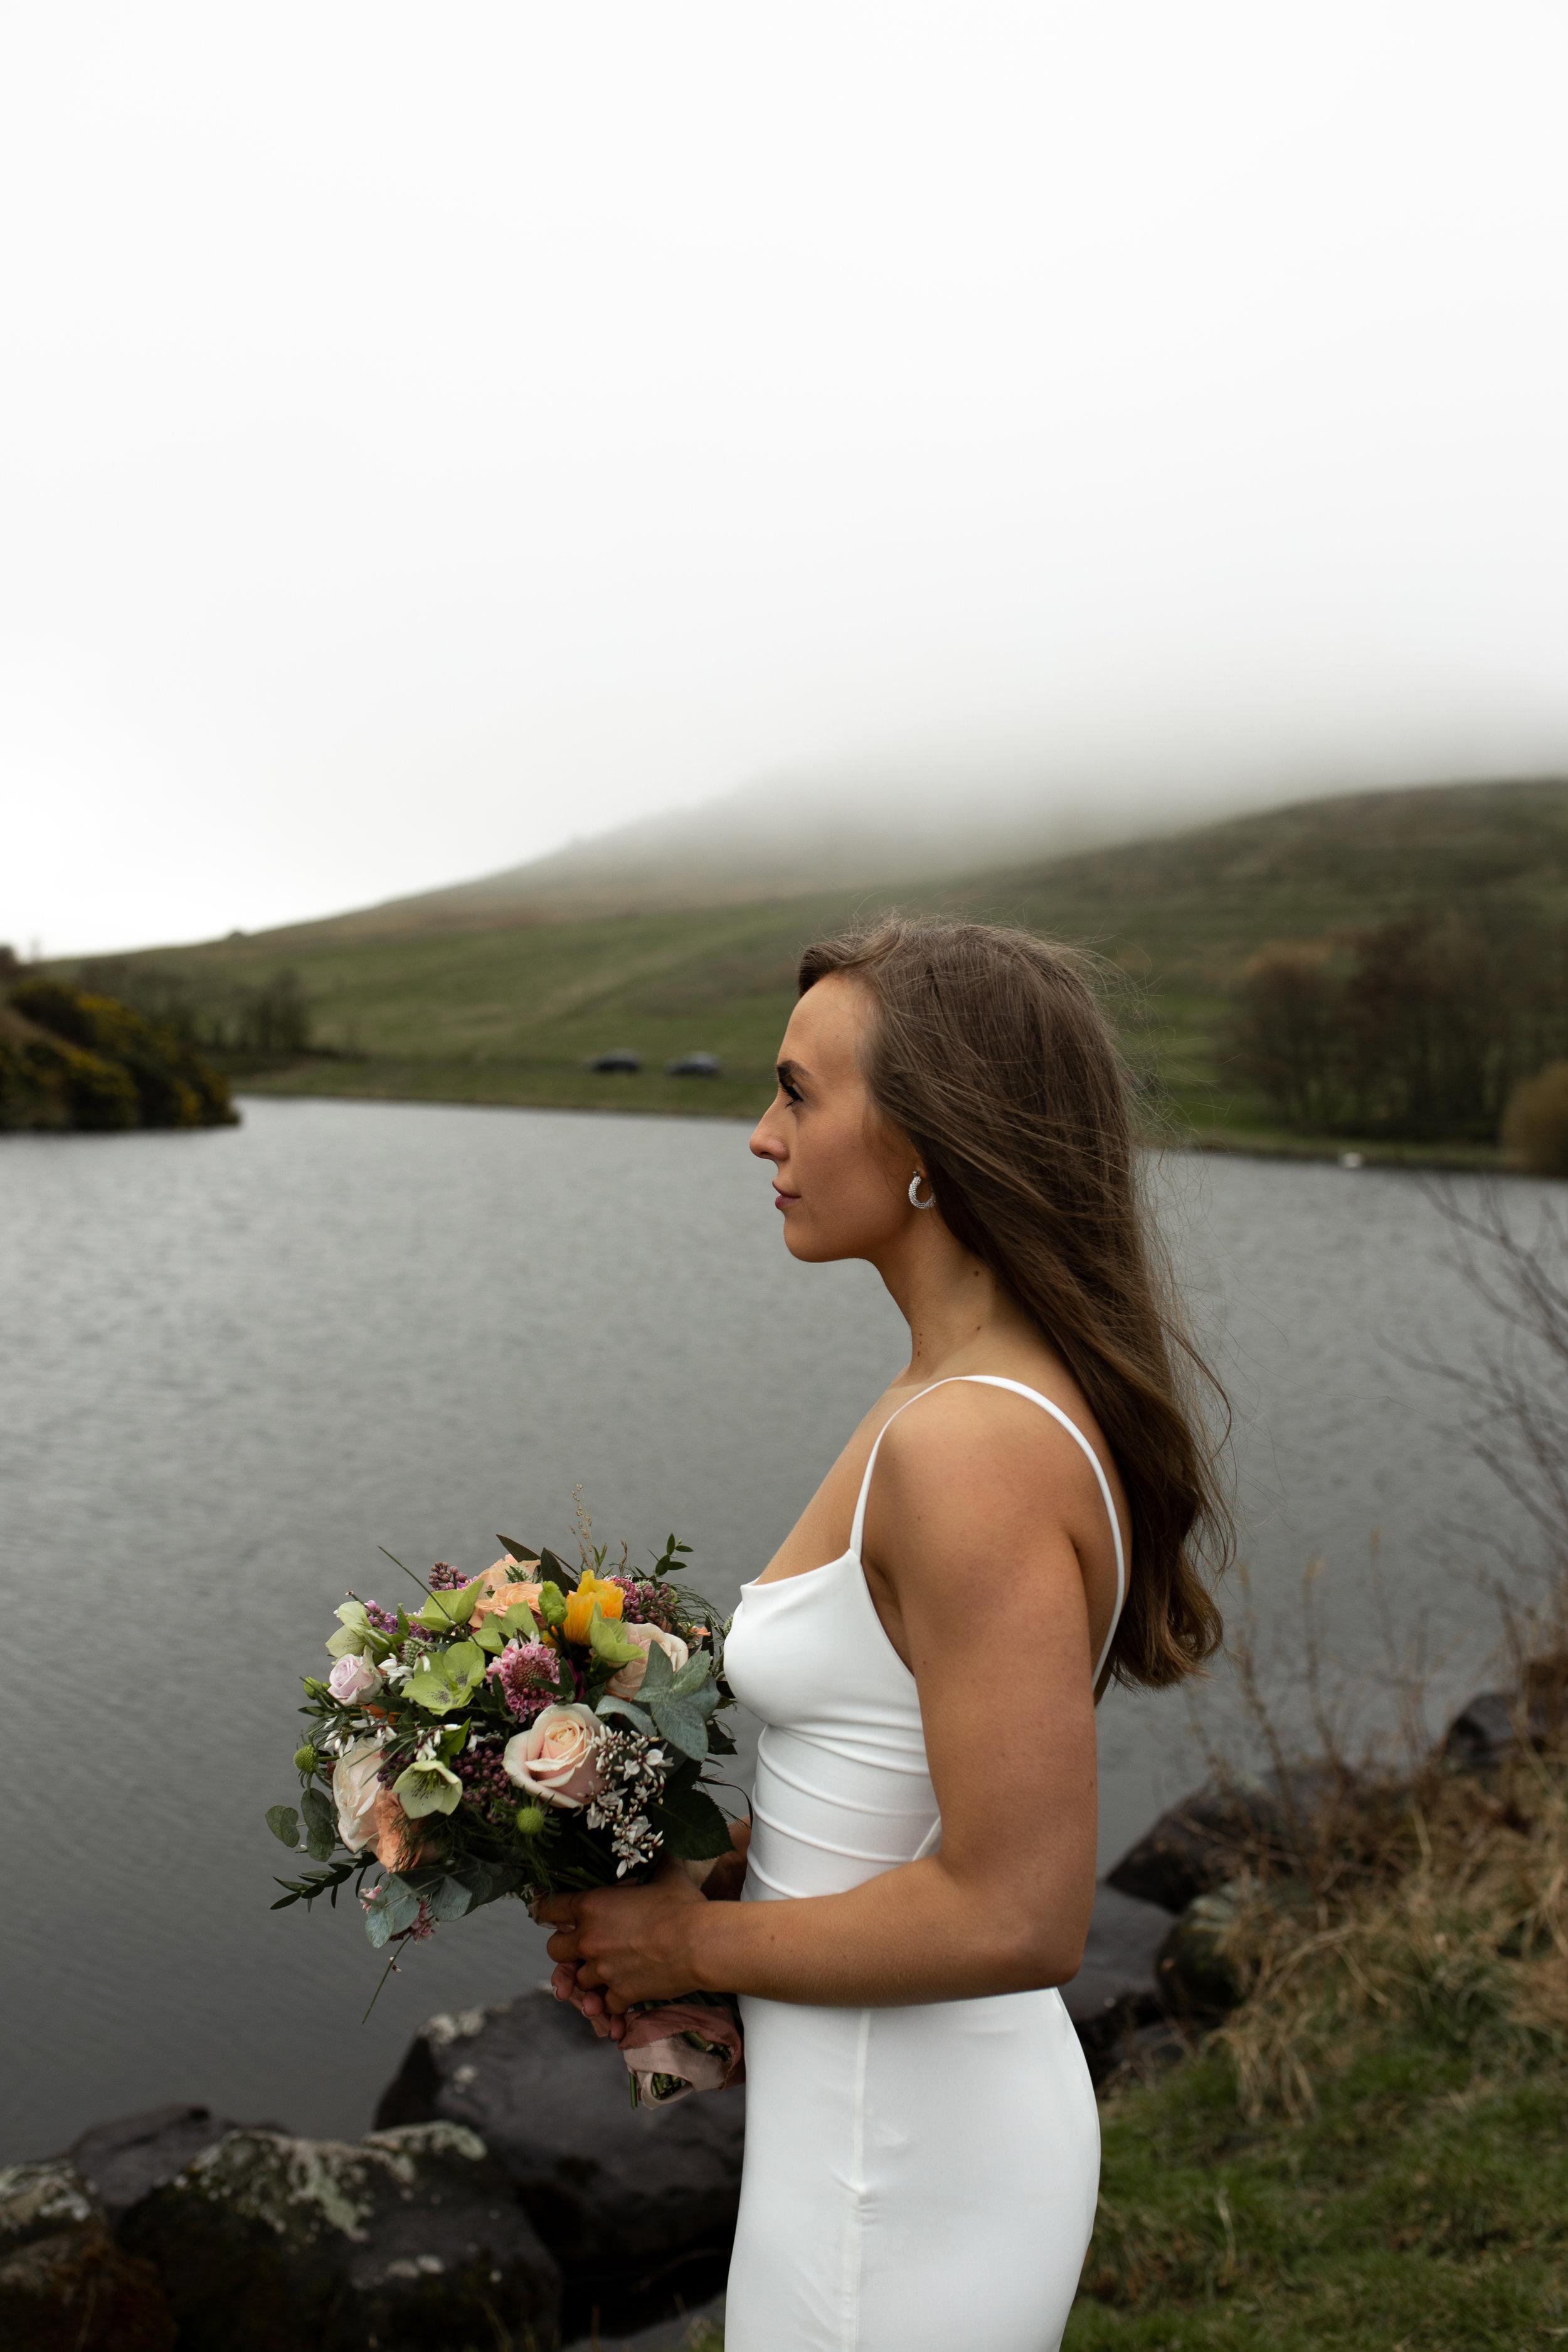 Paula_Russell_Photography_Edinburgh_Wedding_BBonnie_Flowers_8